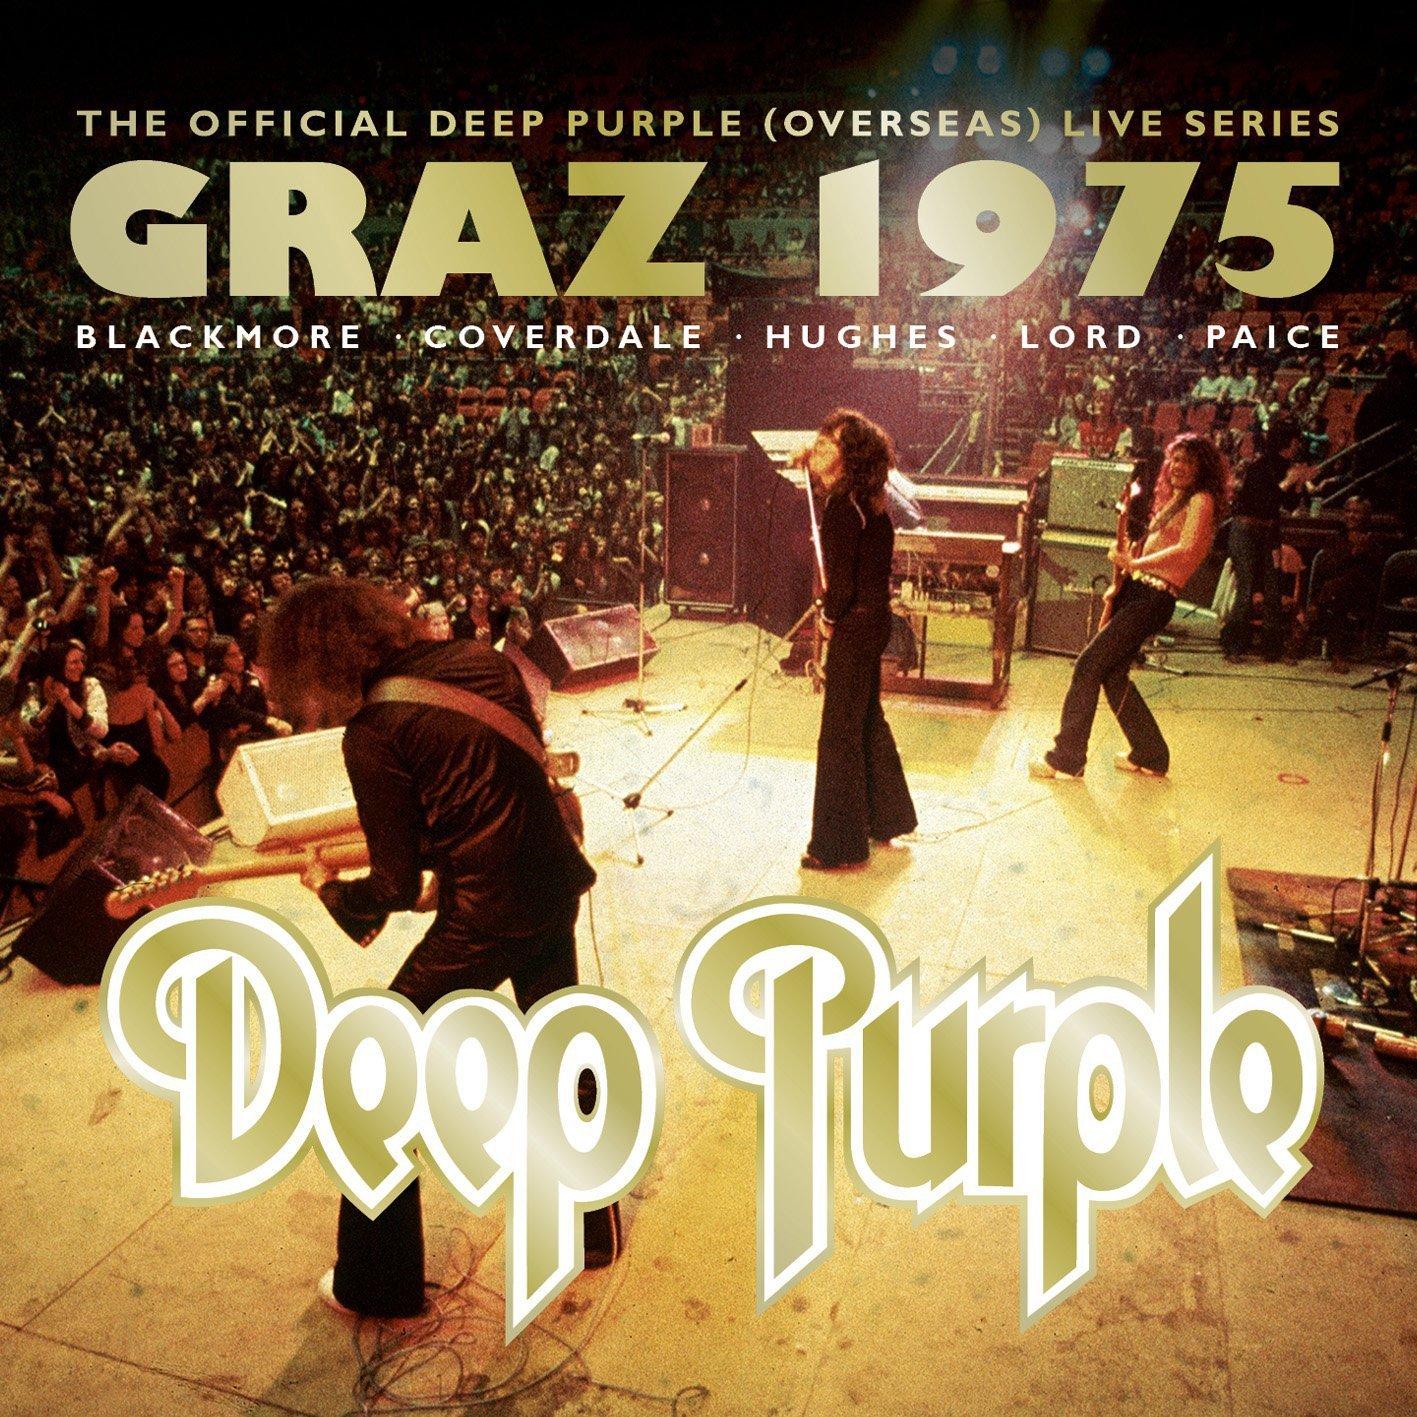 Deep Purple - Graz 1974 [No USA] (Hong Kong - Import)